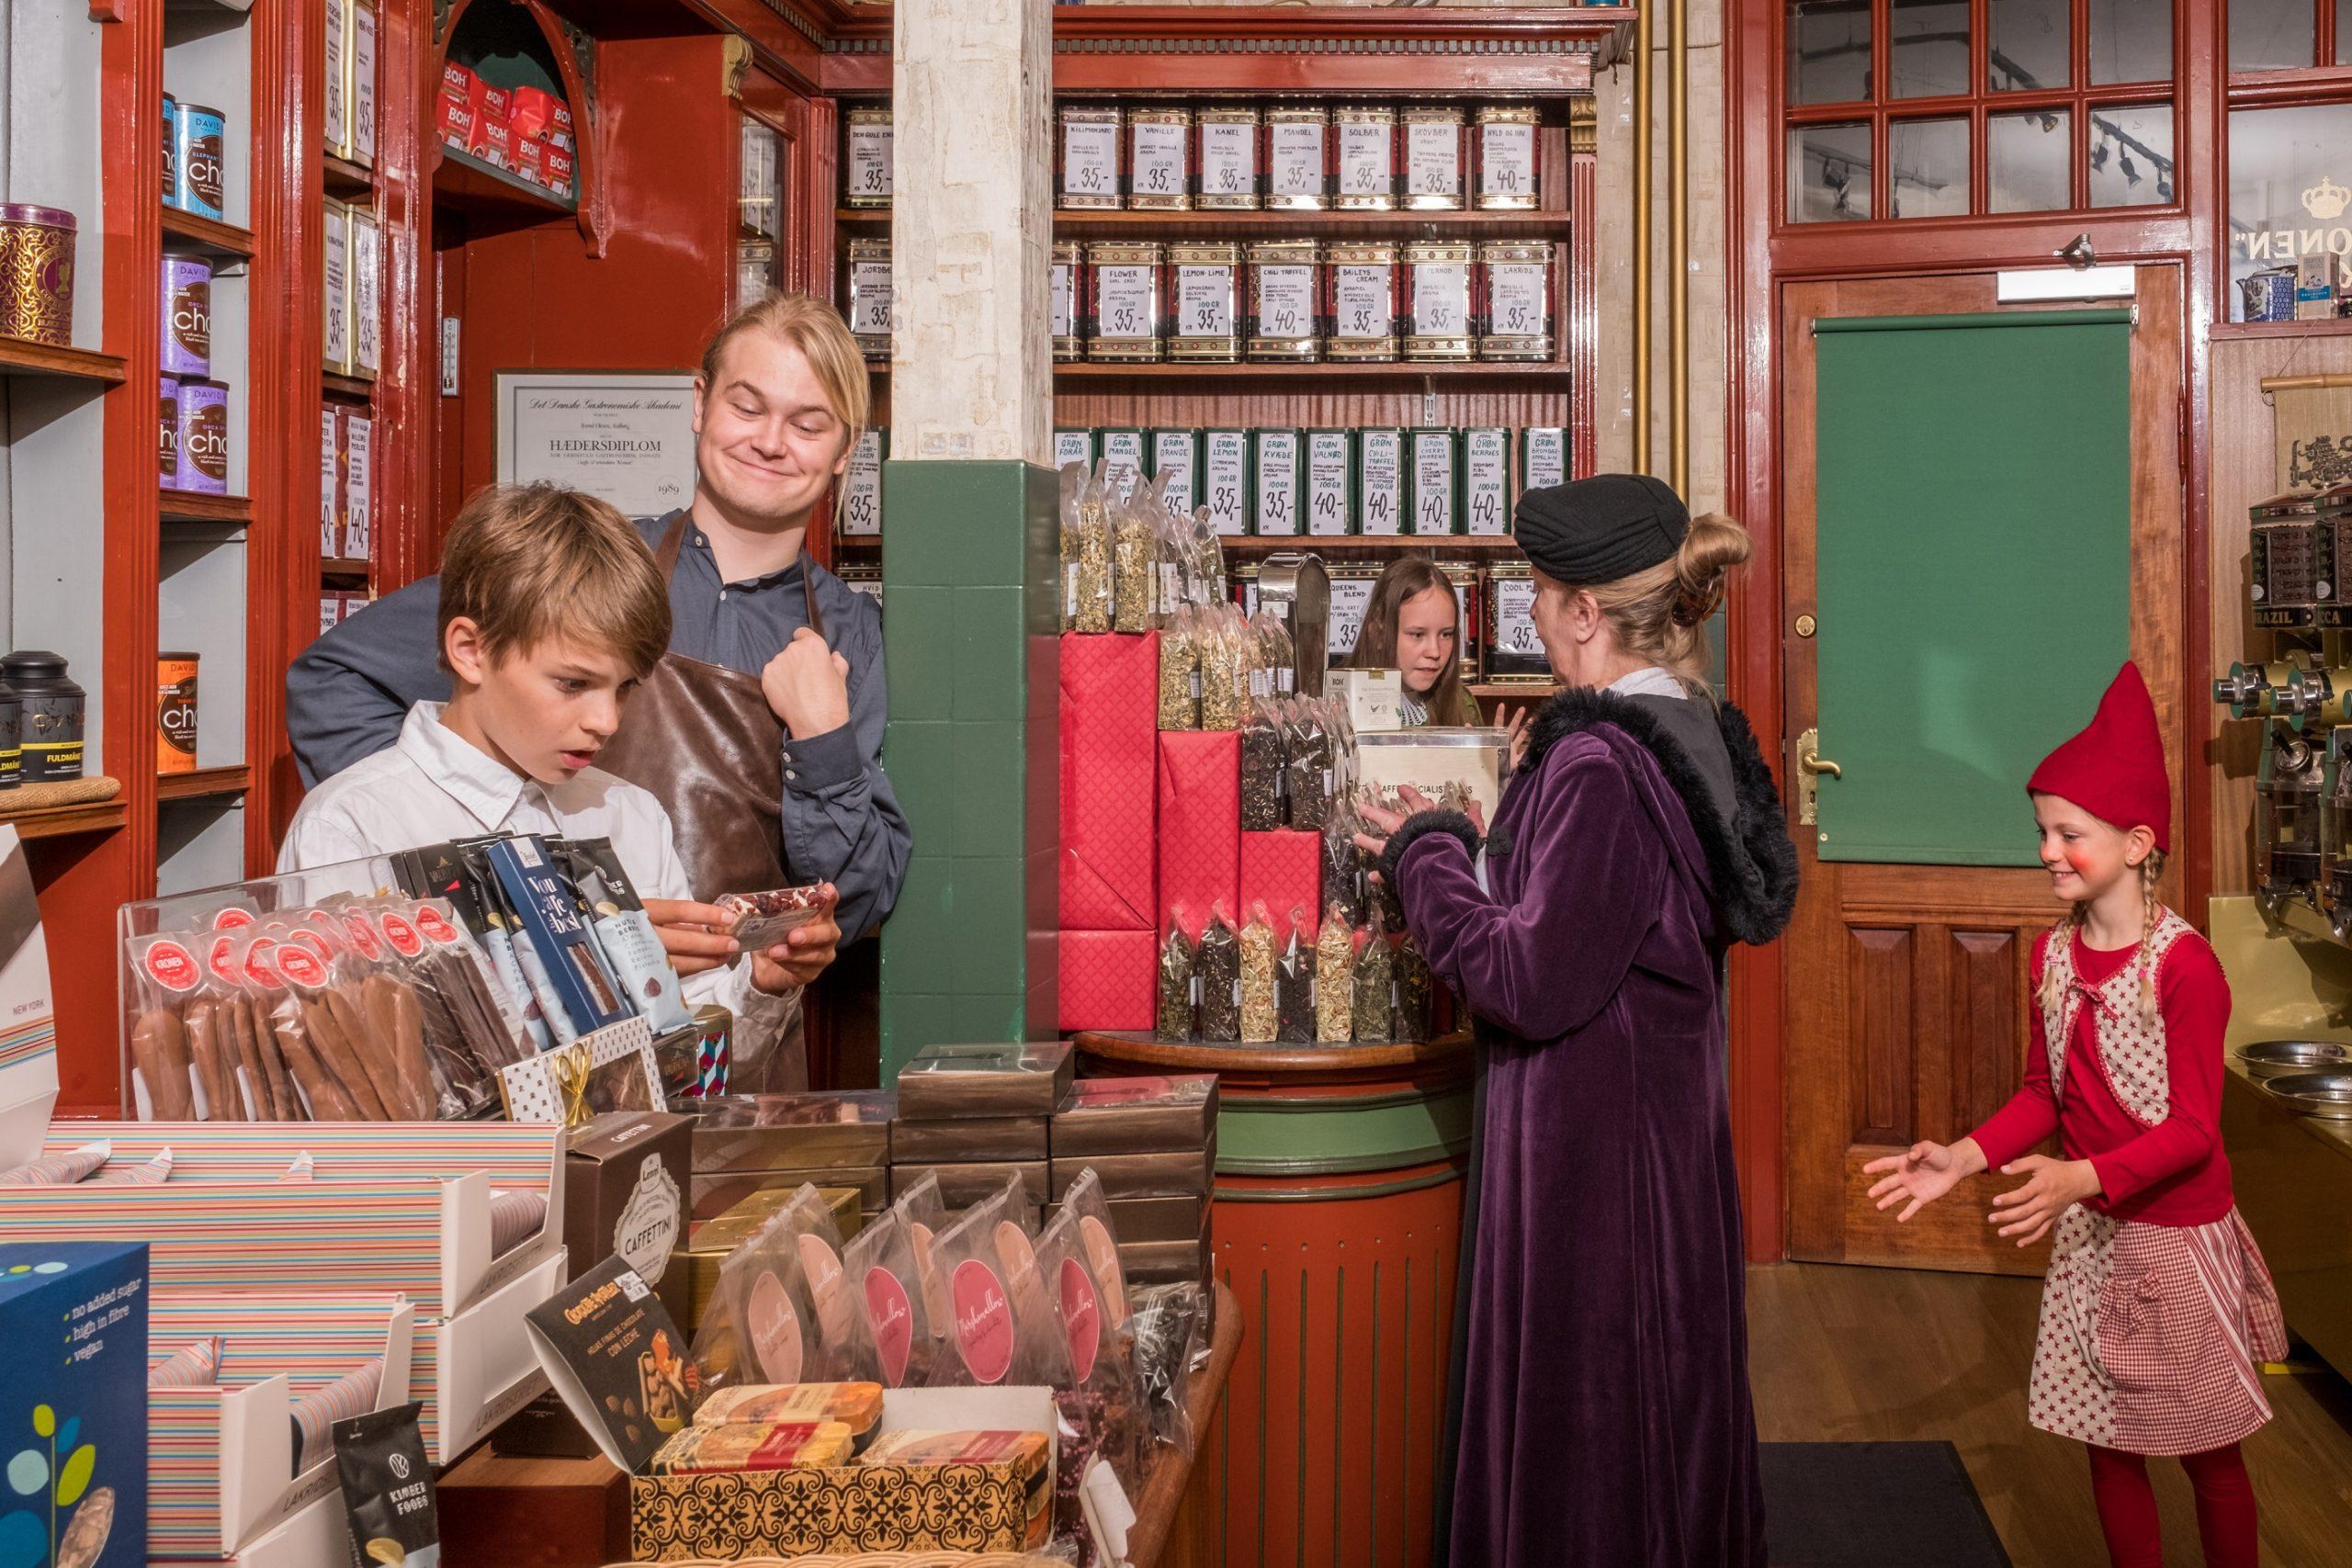 Julen er reddet: Jul i Gammelby er årets juleforestilling i Morskabs-Theatret